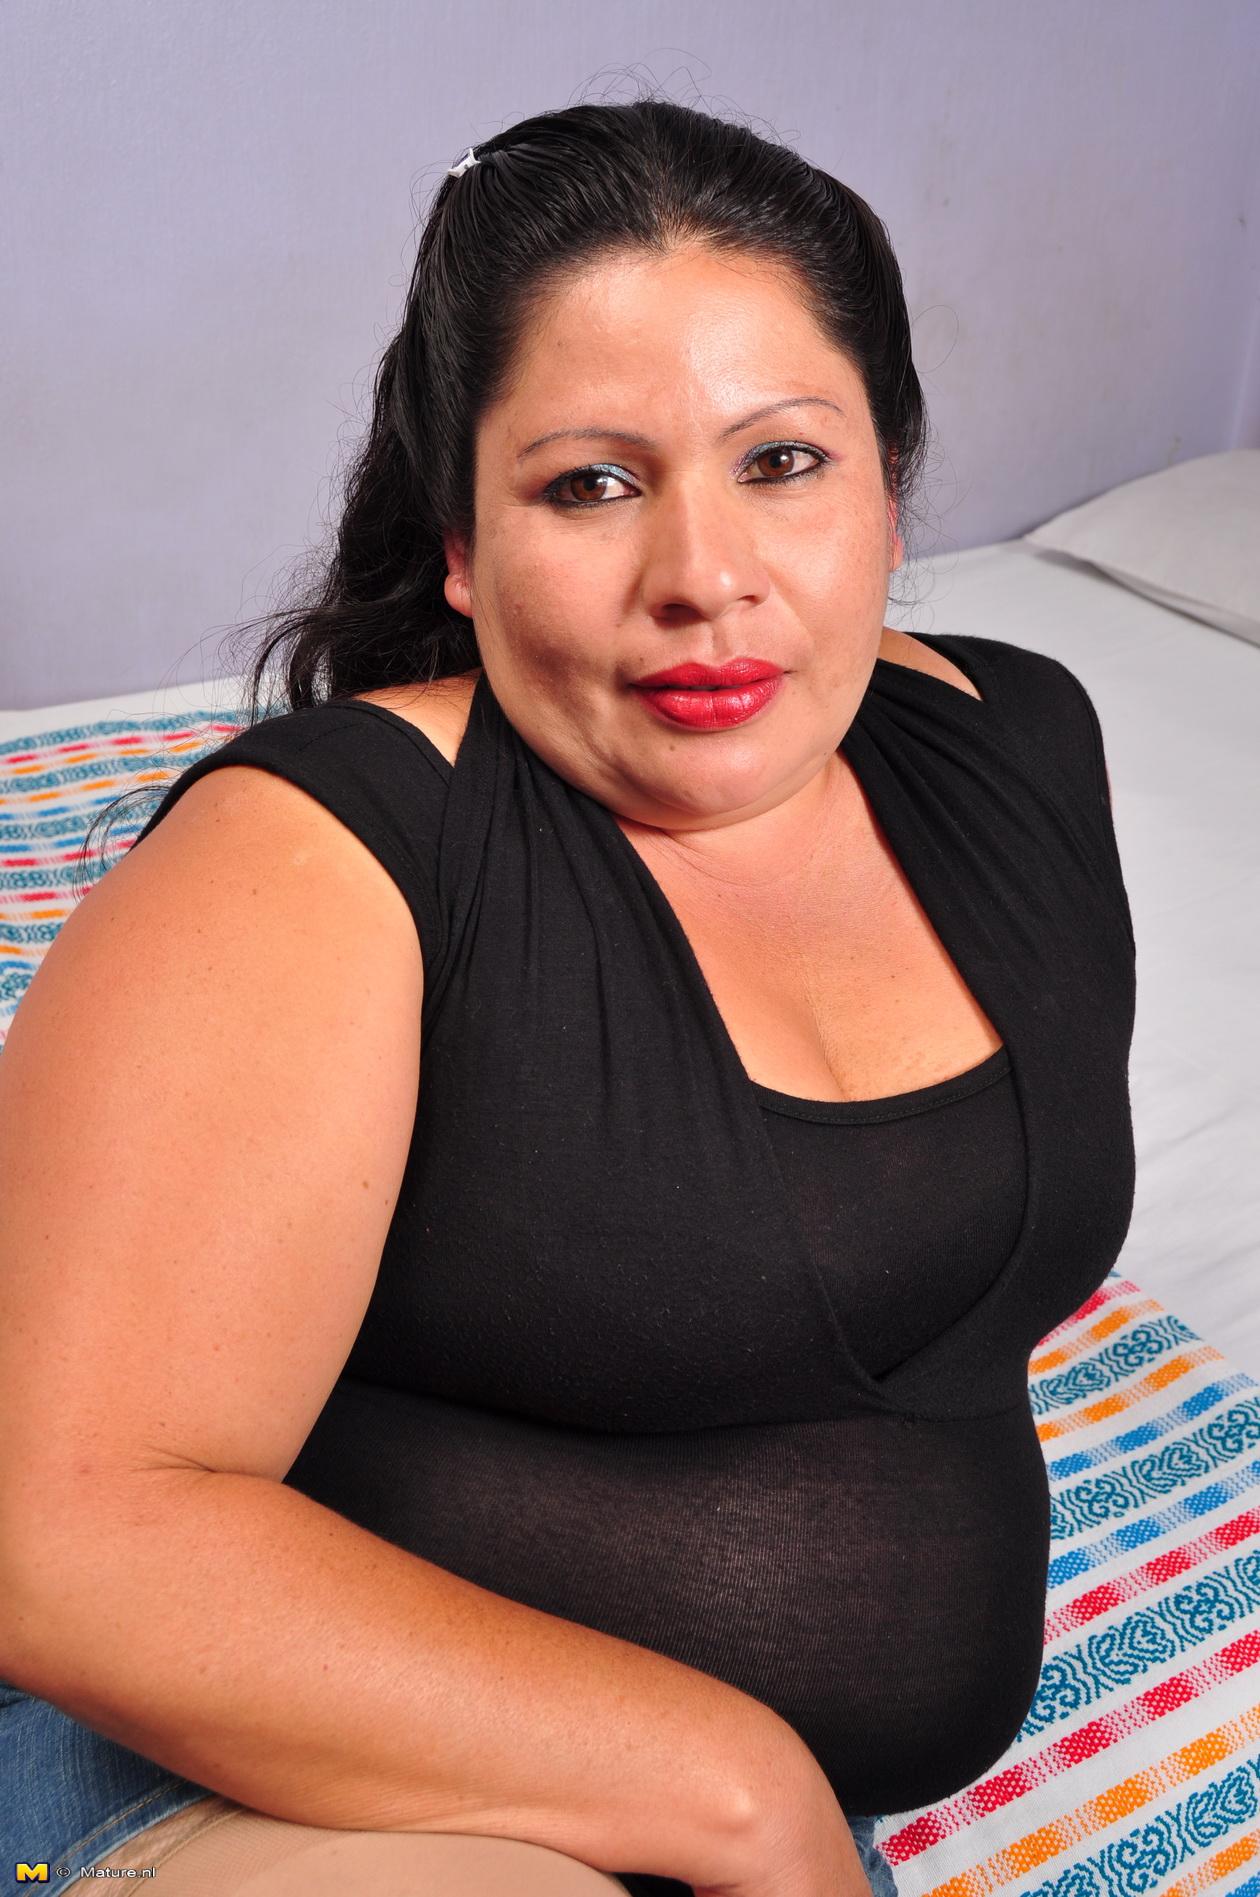 Nude Latin Bbw Pretty mature hairy latina bbw playing alone